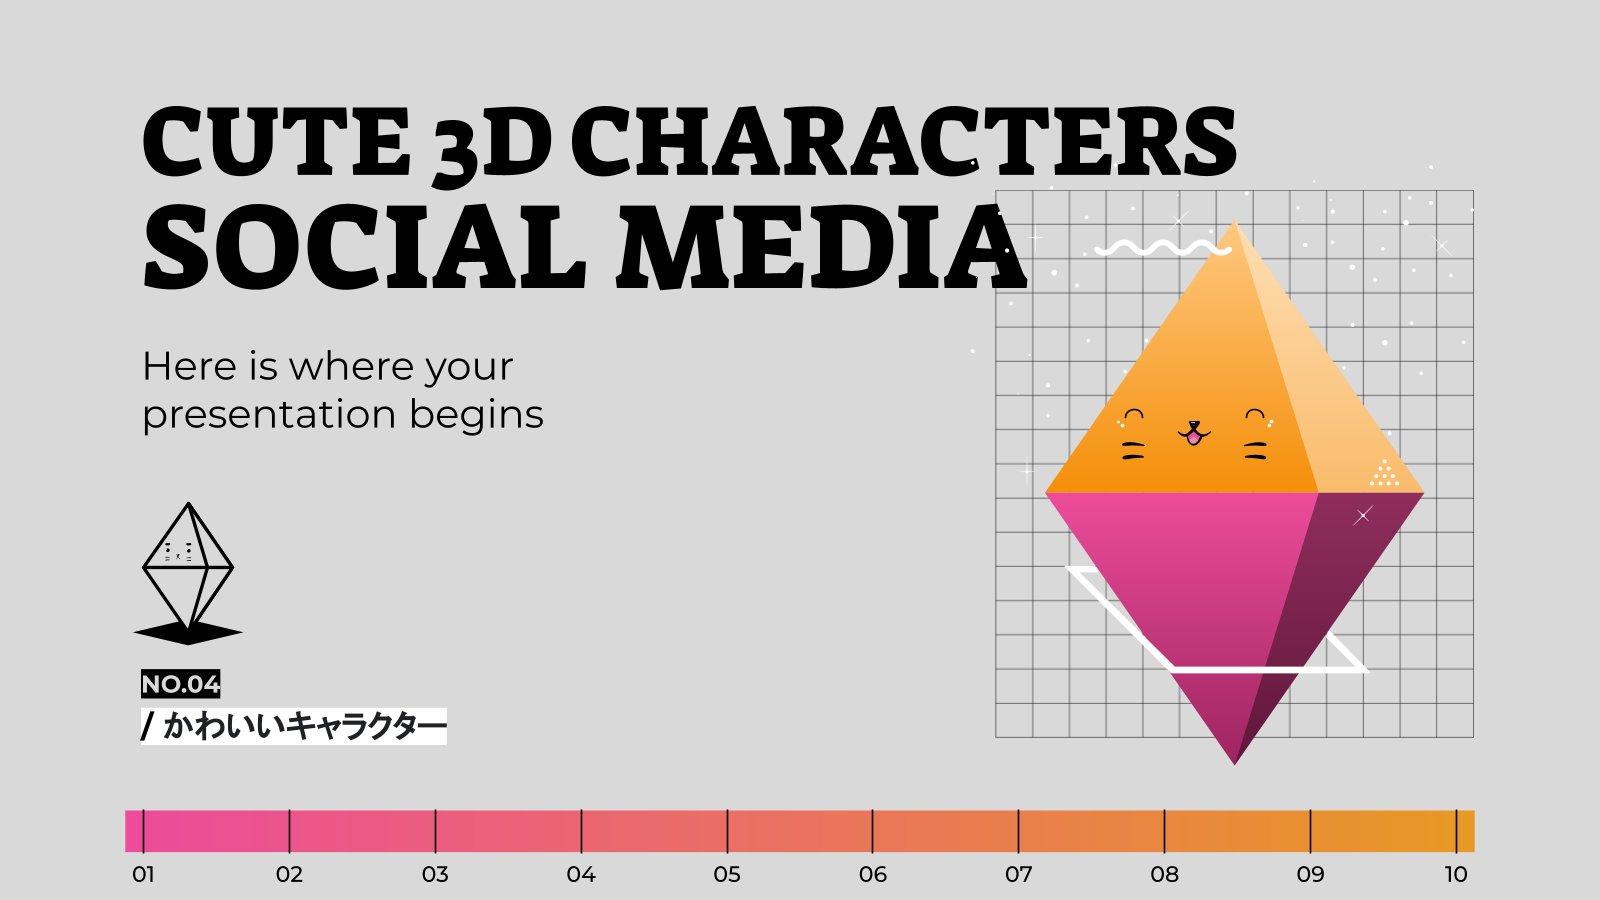 Cute 3D Characters Social Media presentation template